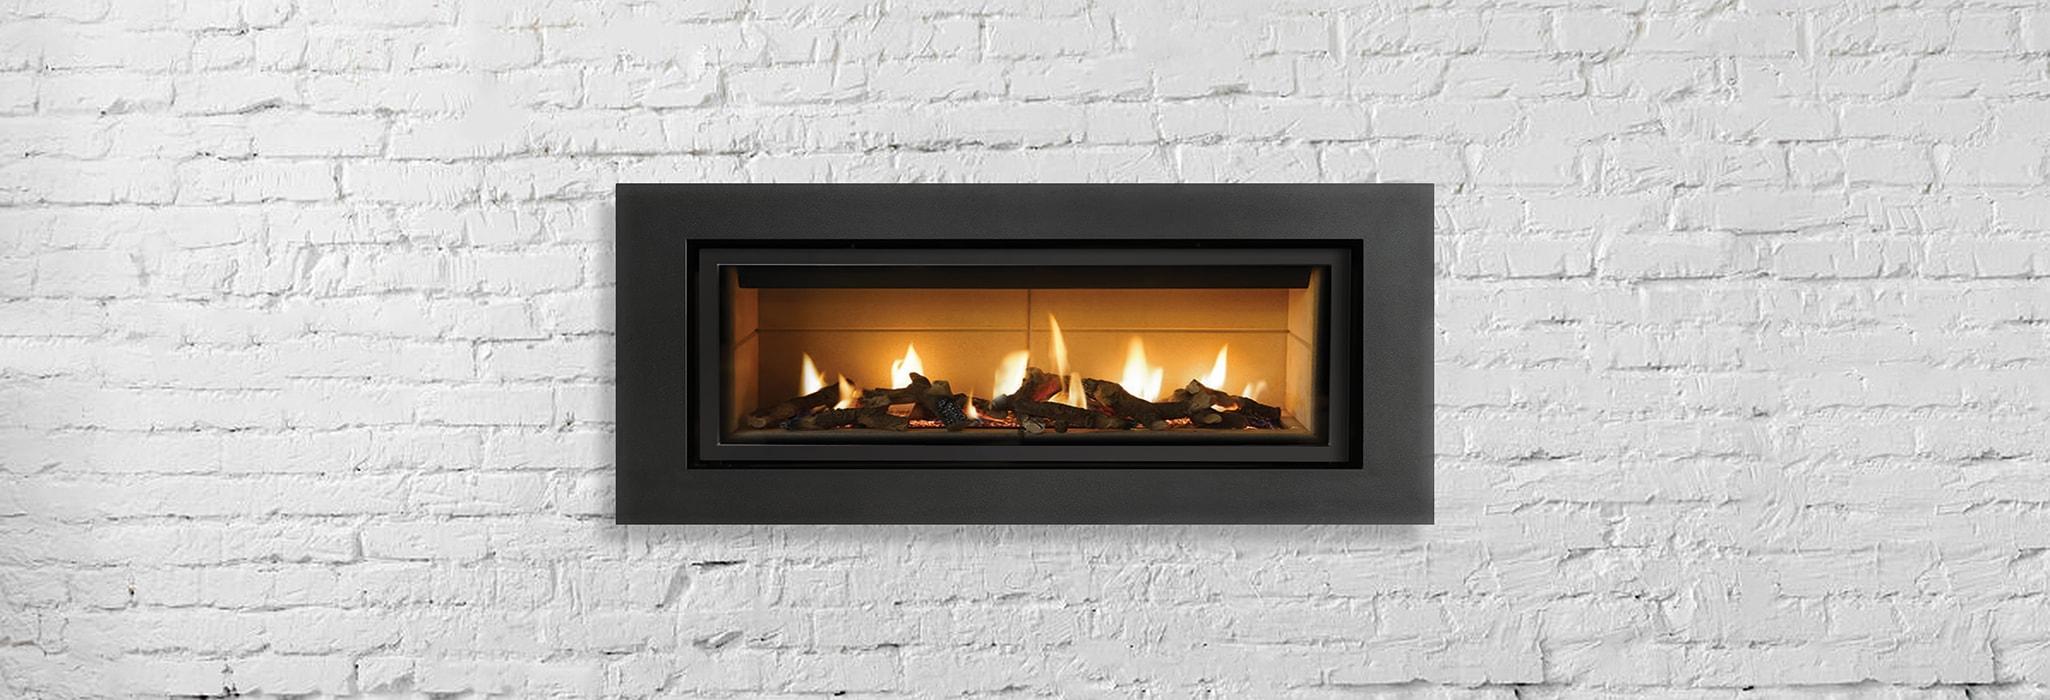 Gas fireplace service.